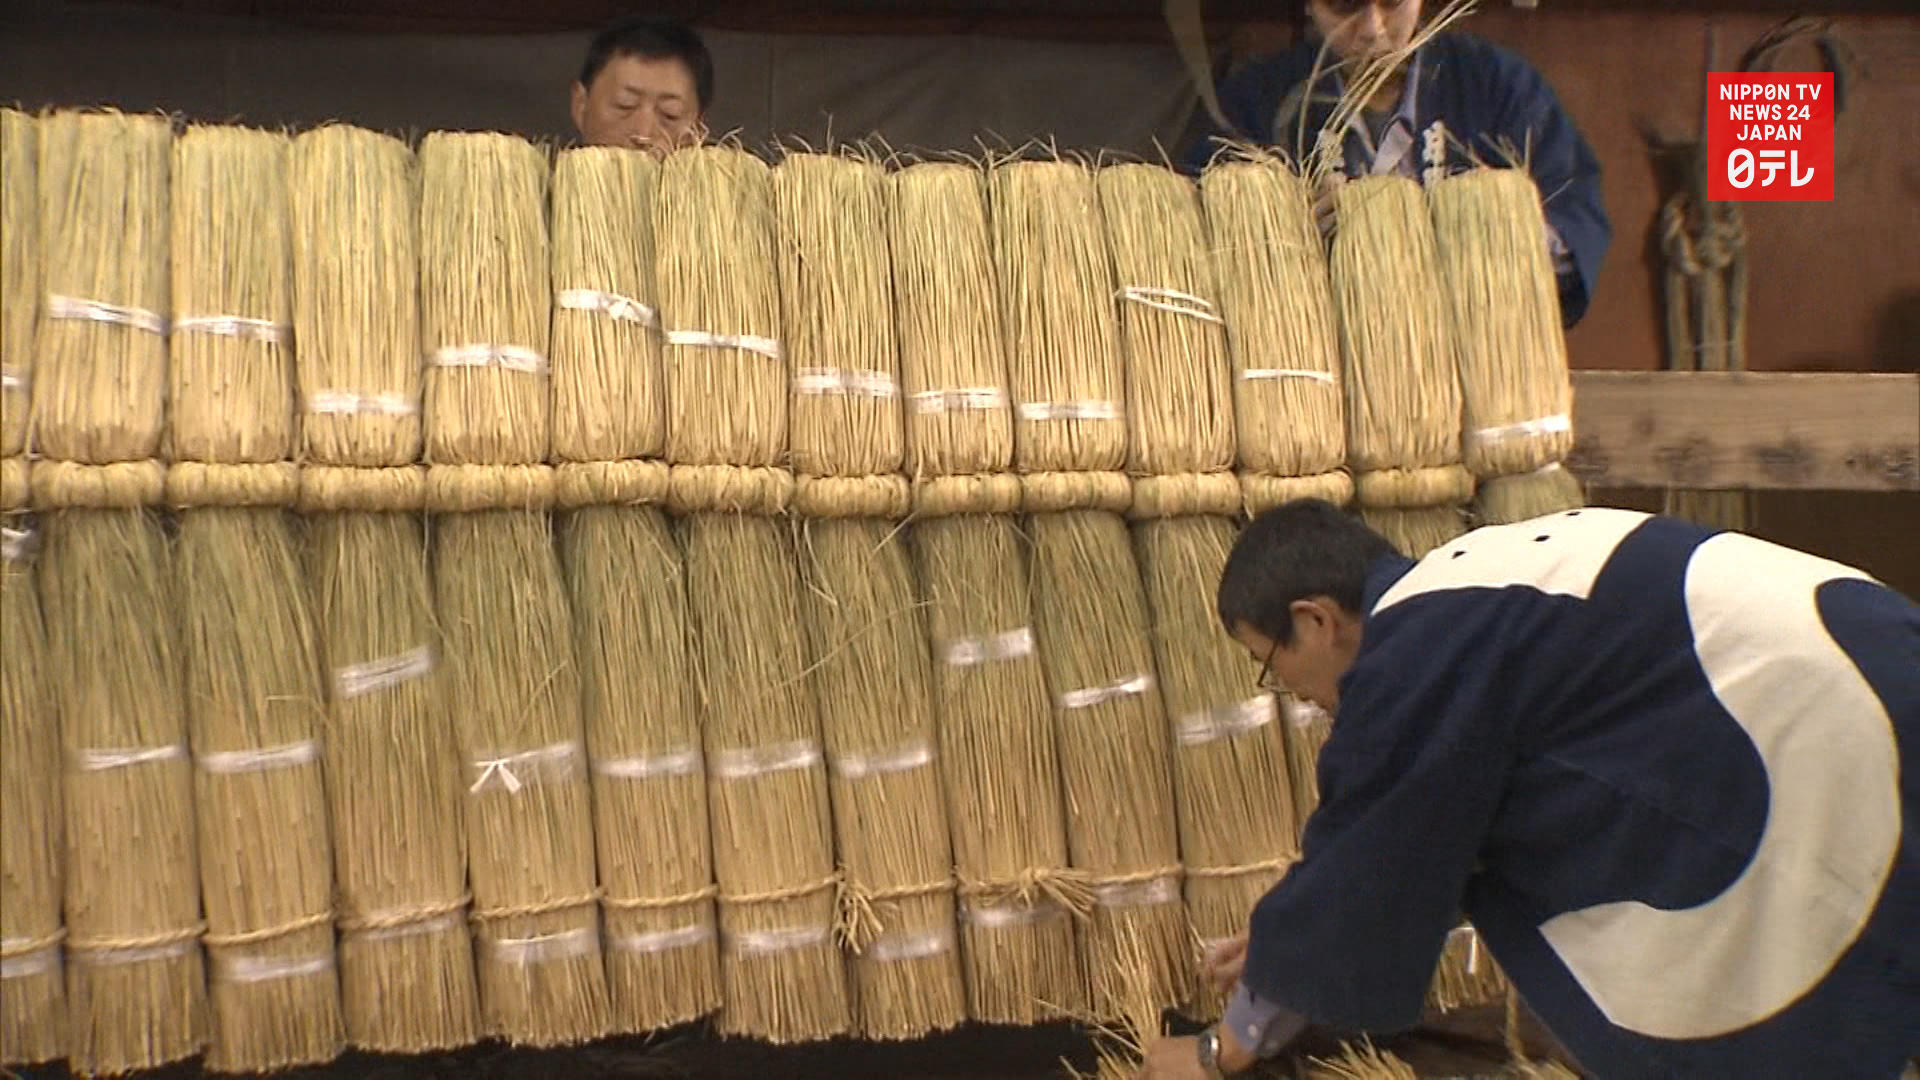 Buddhist temple's 6m rope decoration